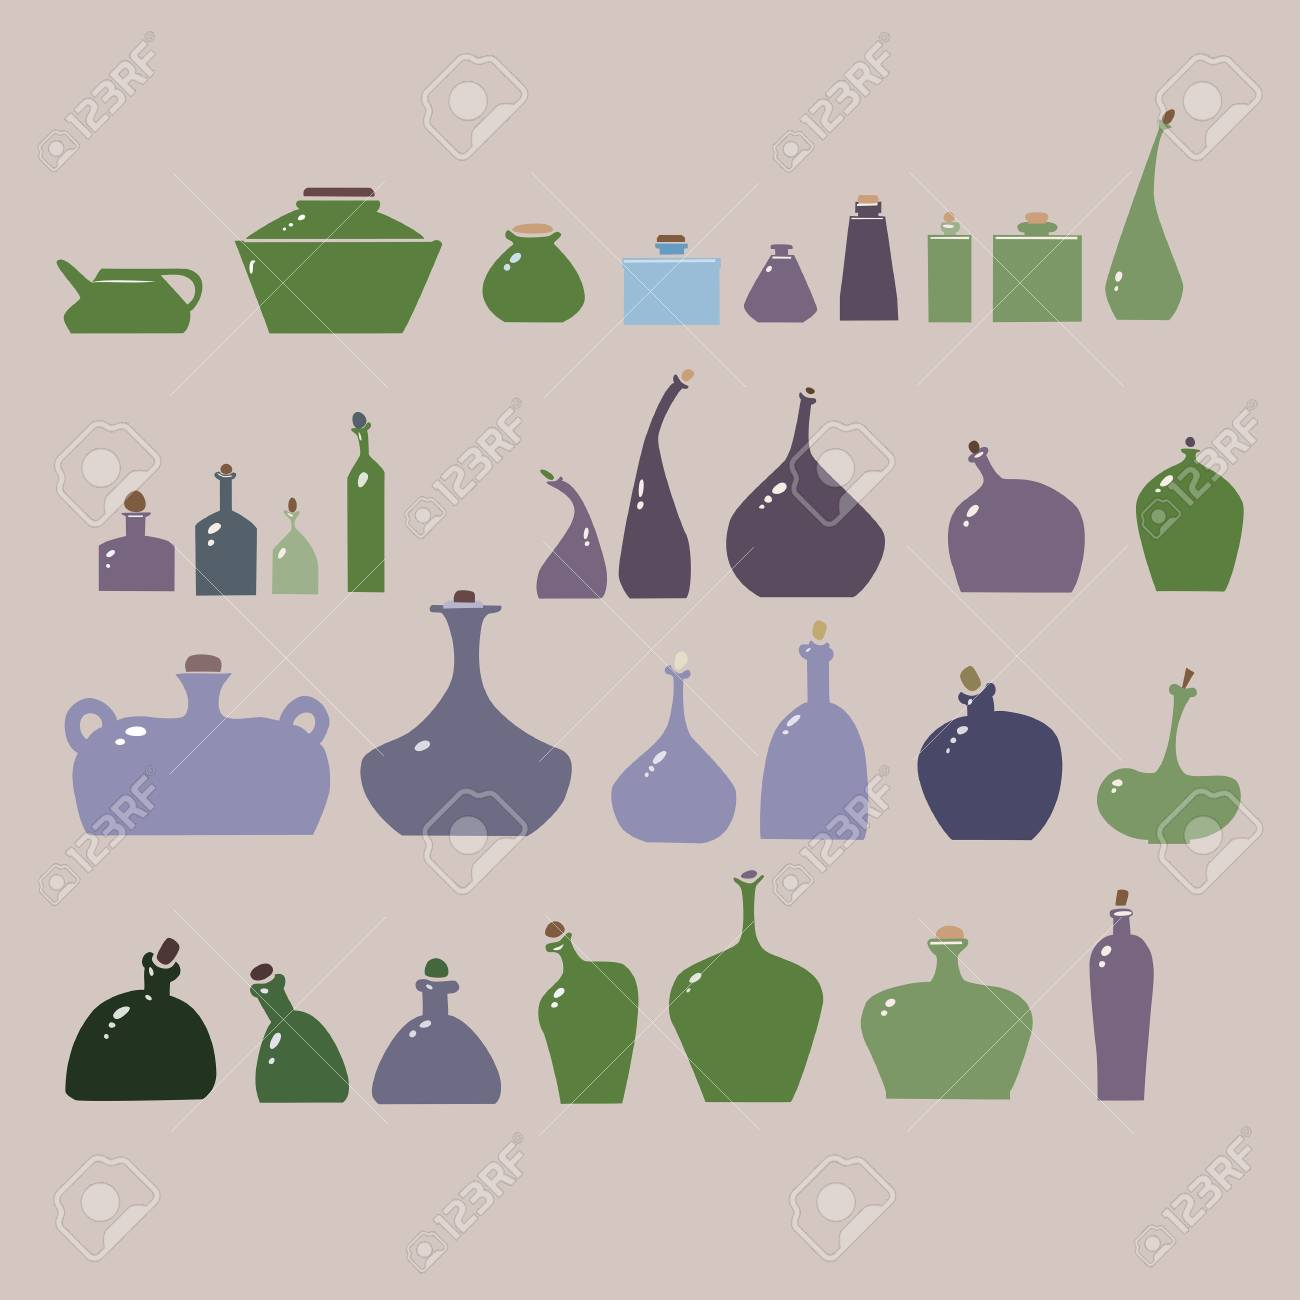 Vector illustration of bottles and glasses set. Stock Vector - 17910208